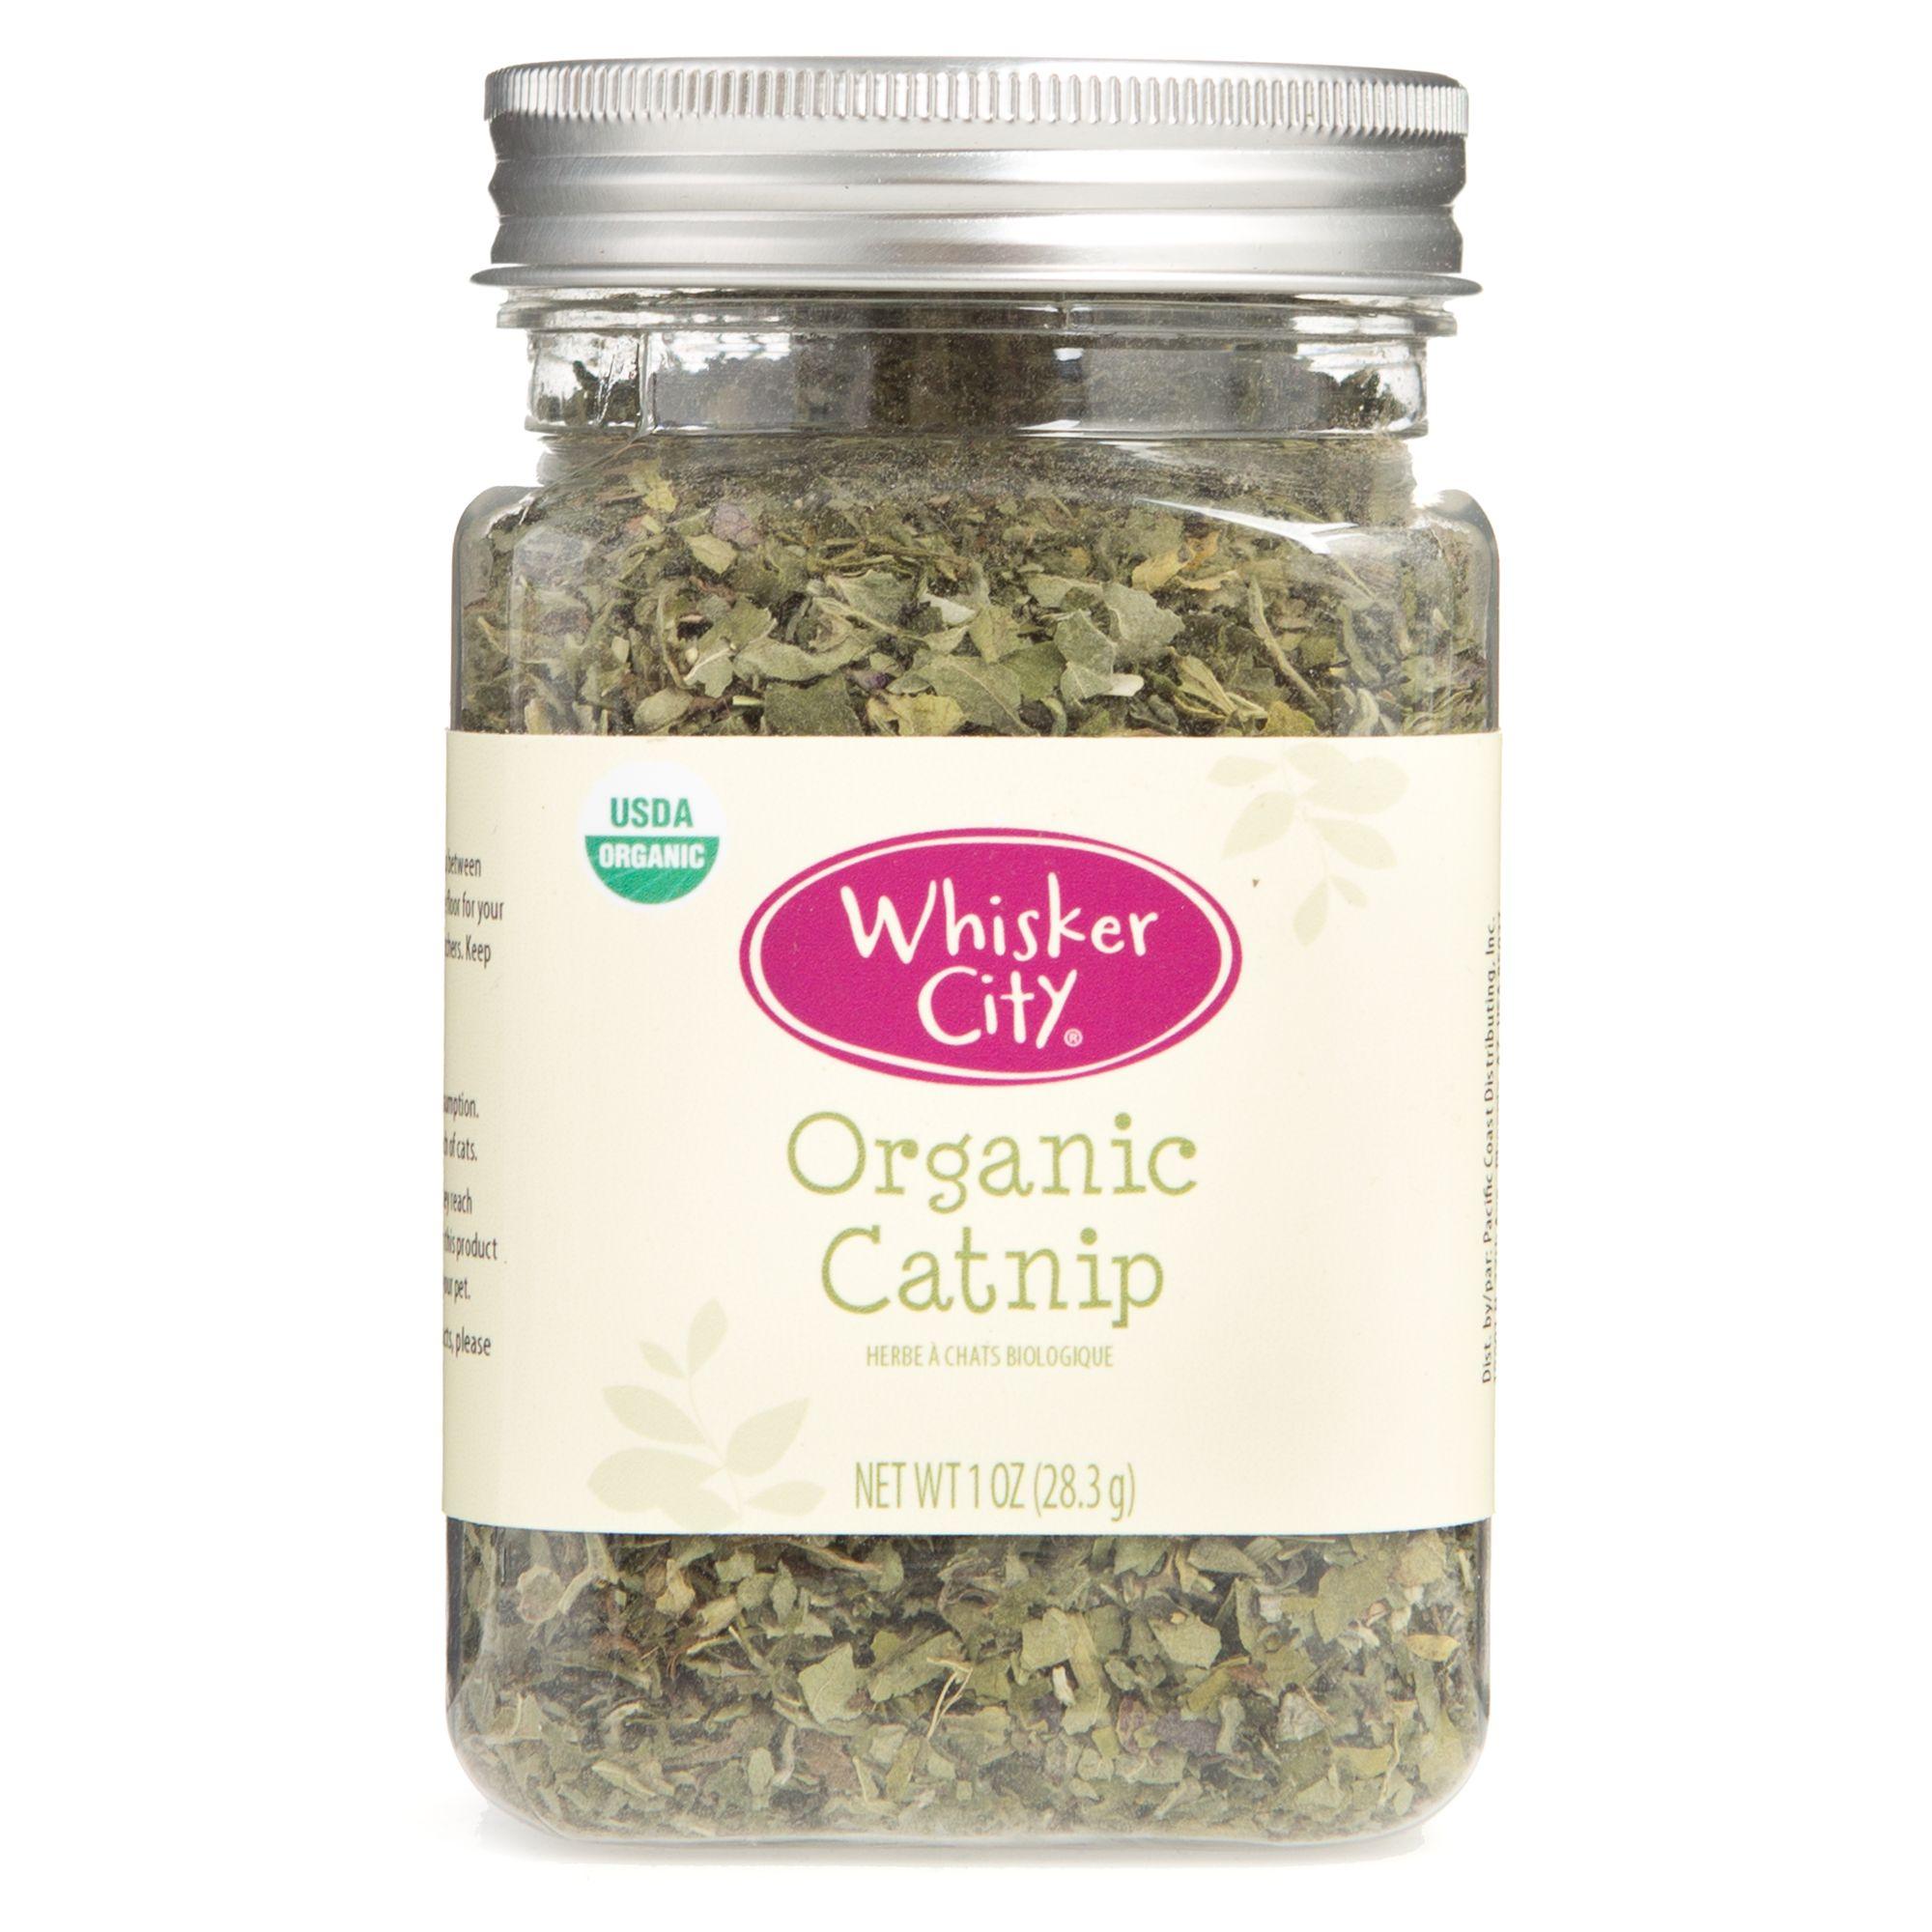 Whisker City Organic Catnip size: 1 Oz 5266795